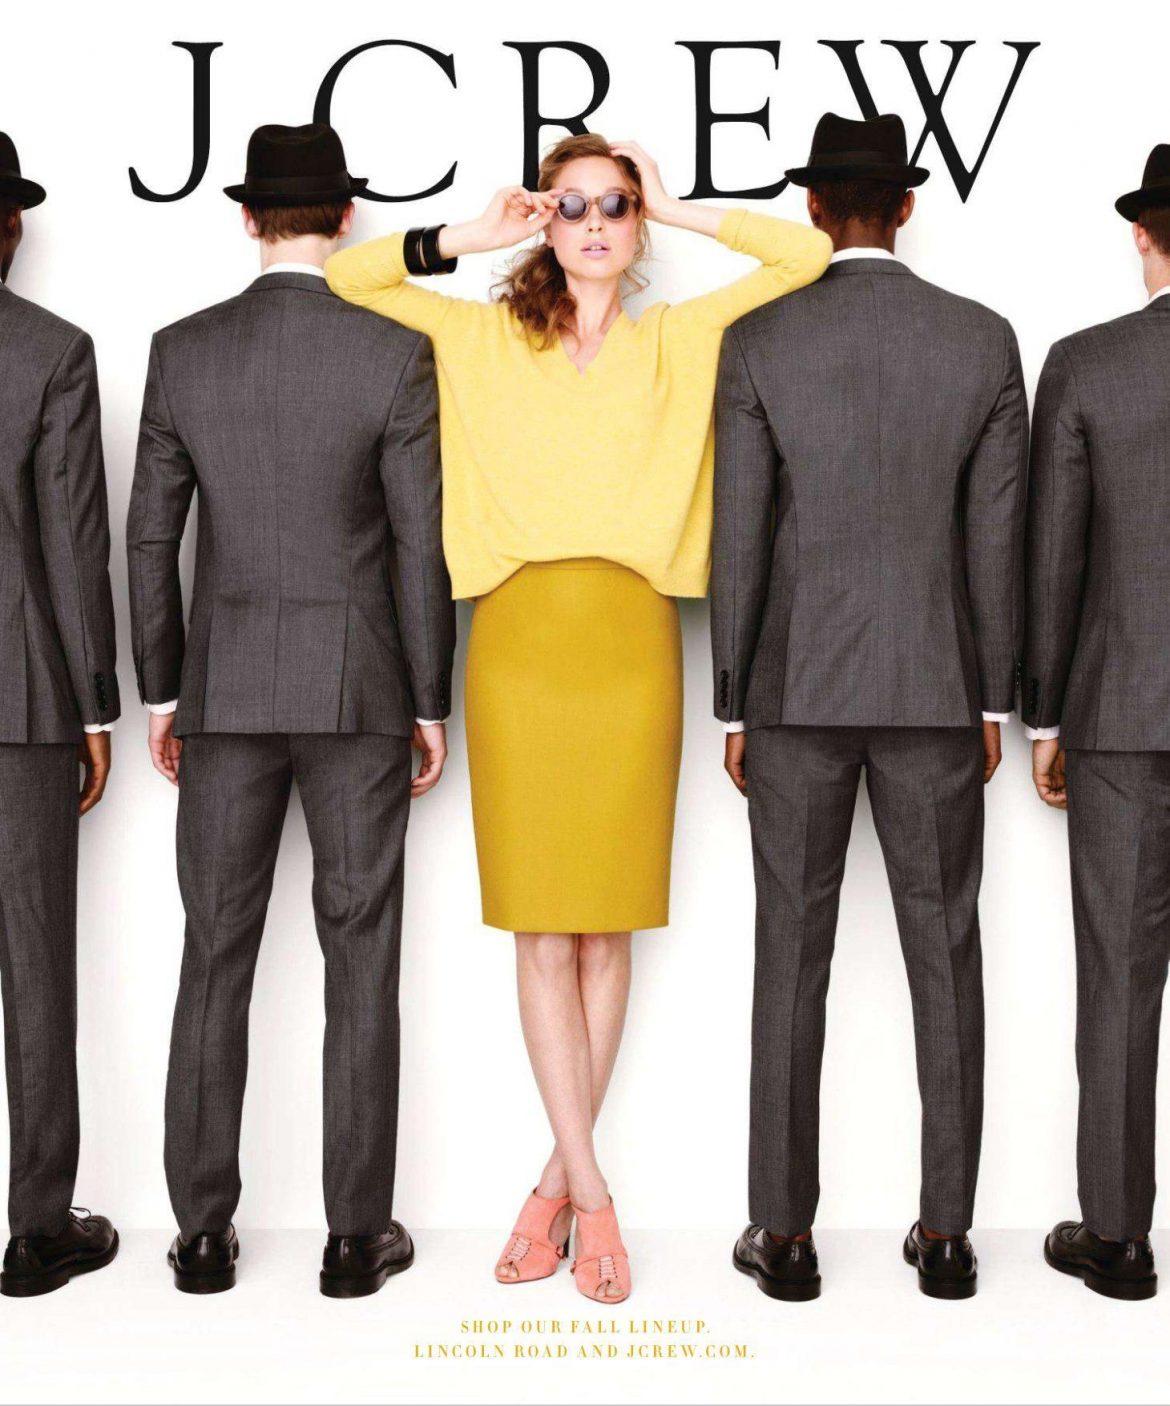 Top Luxury Brands | J.Crew  Top Luxury Brands | J.Crew Top Luxury Brands J Crew 18